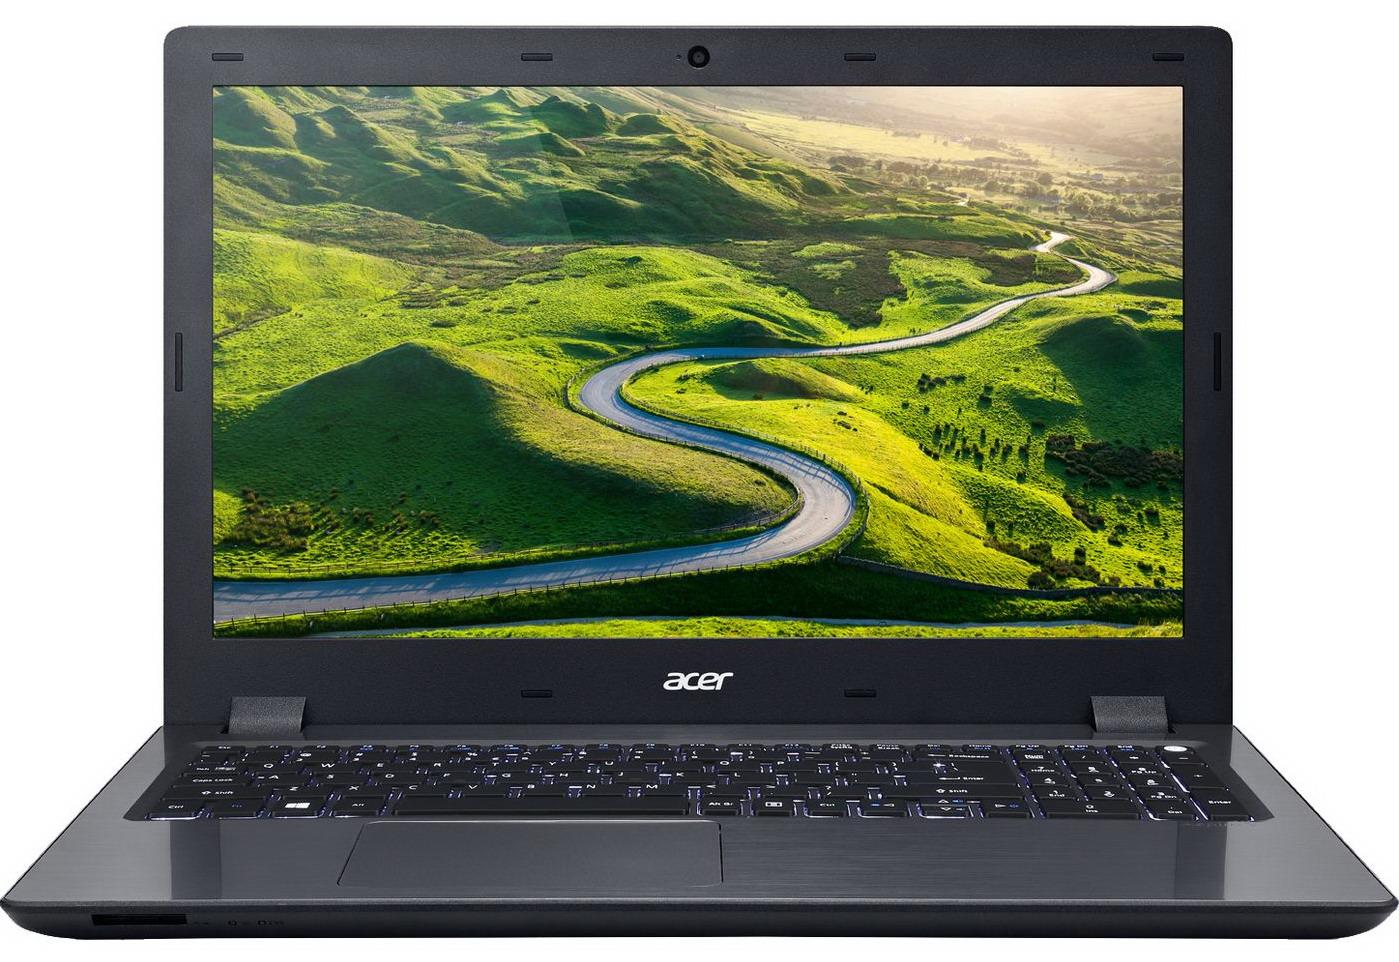 Acer Aspire V5-591G-588D